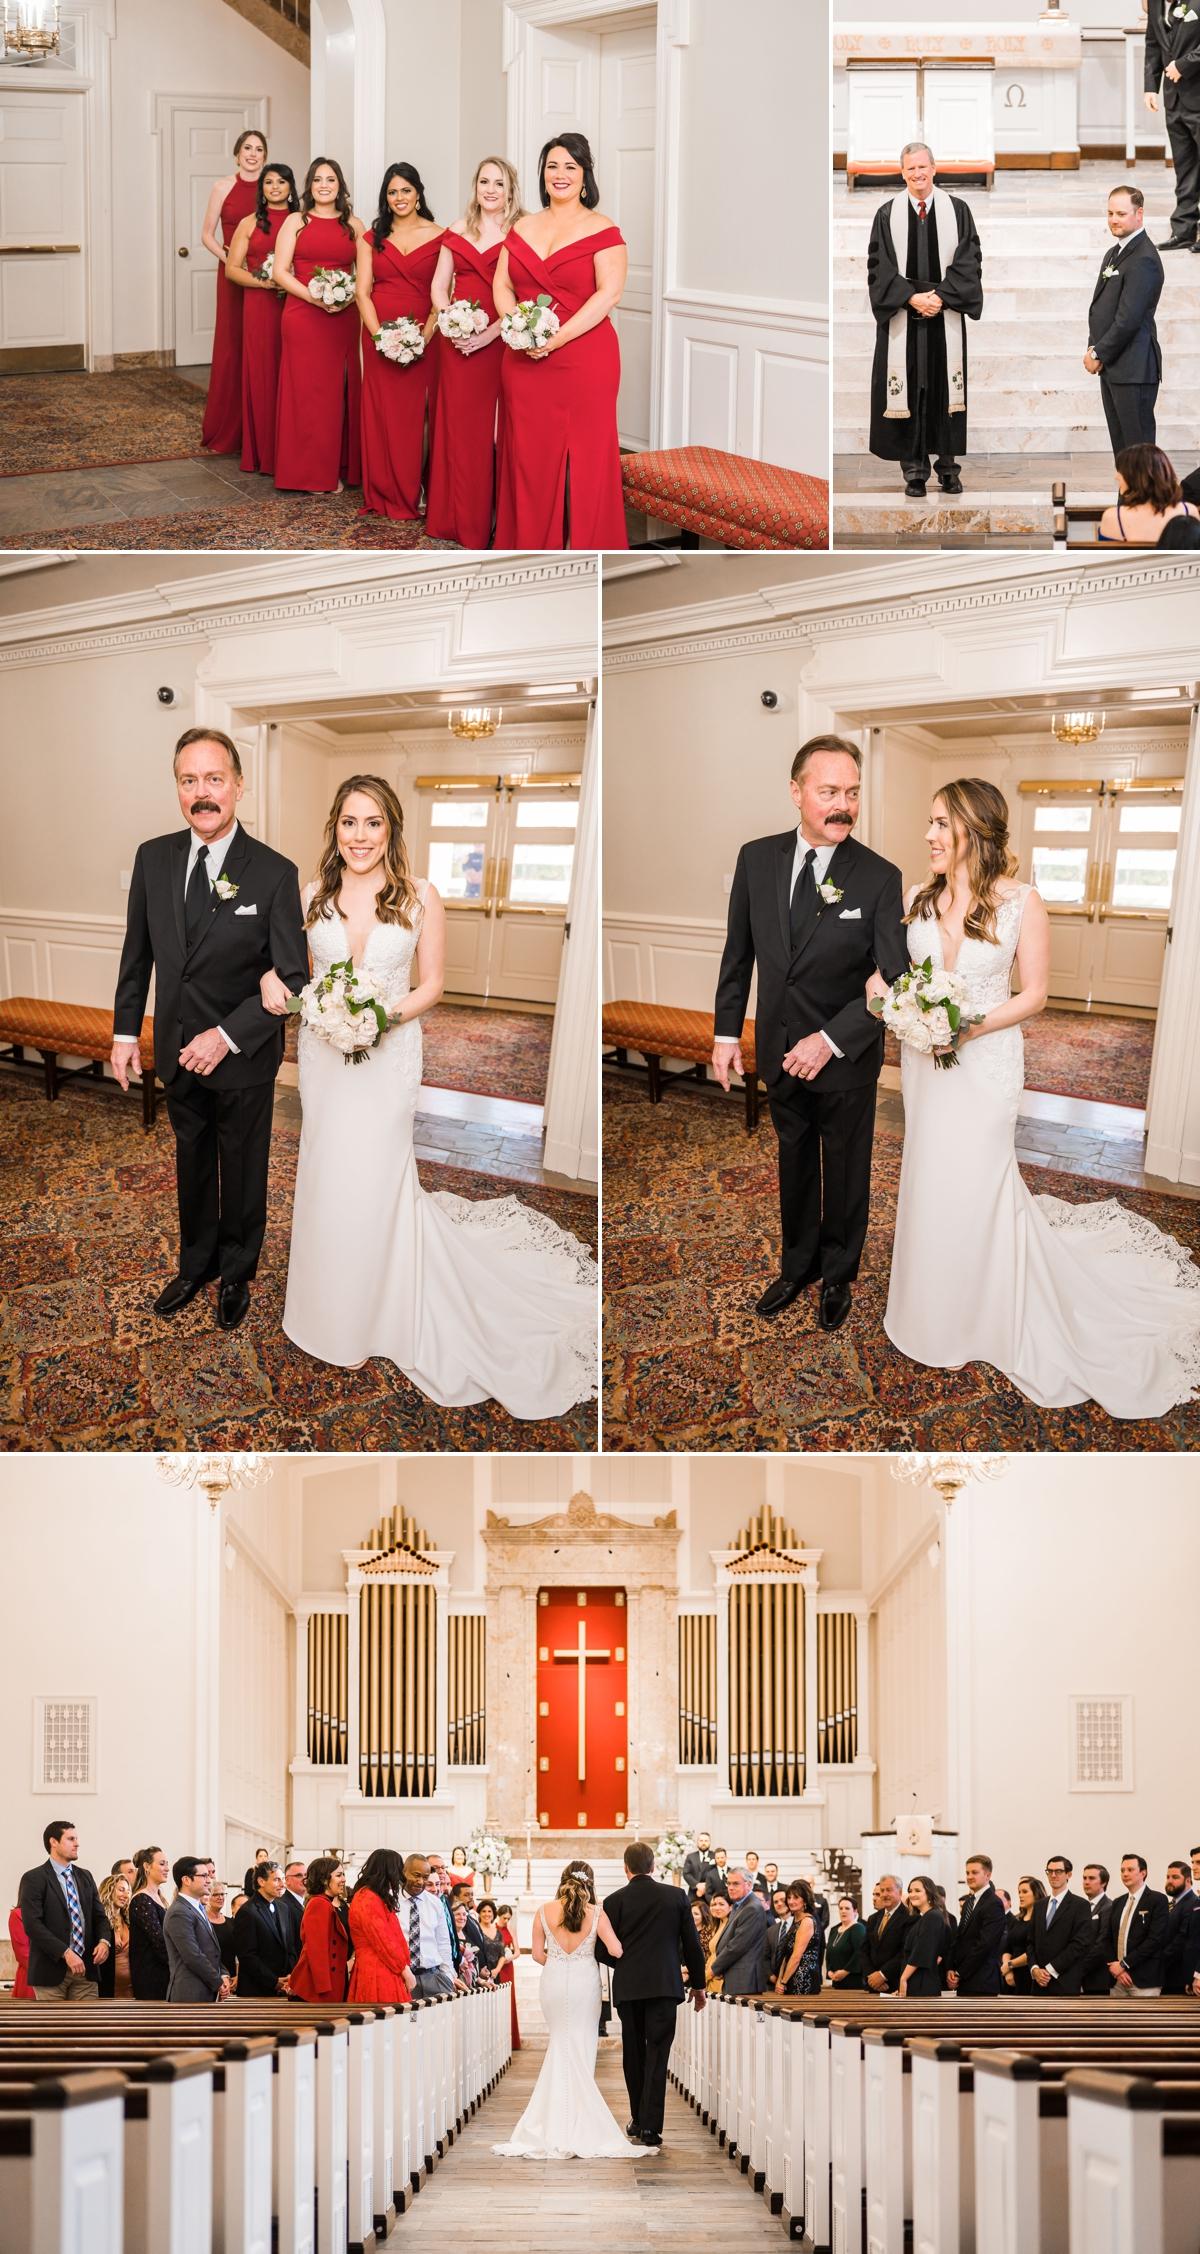 St. Luke's United Methodist Church Wedding in Houston